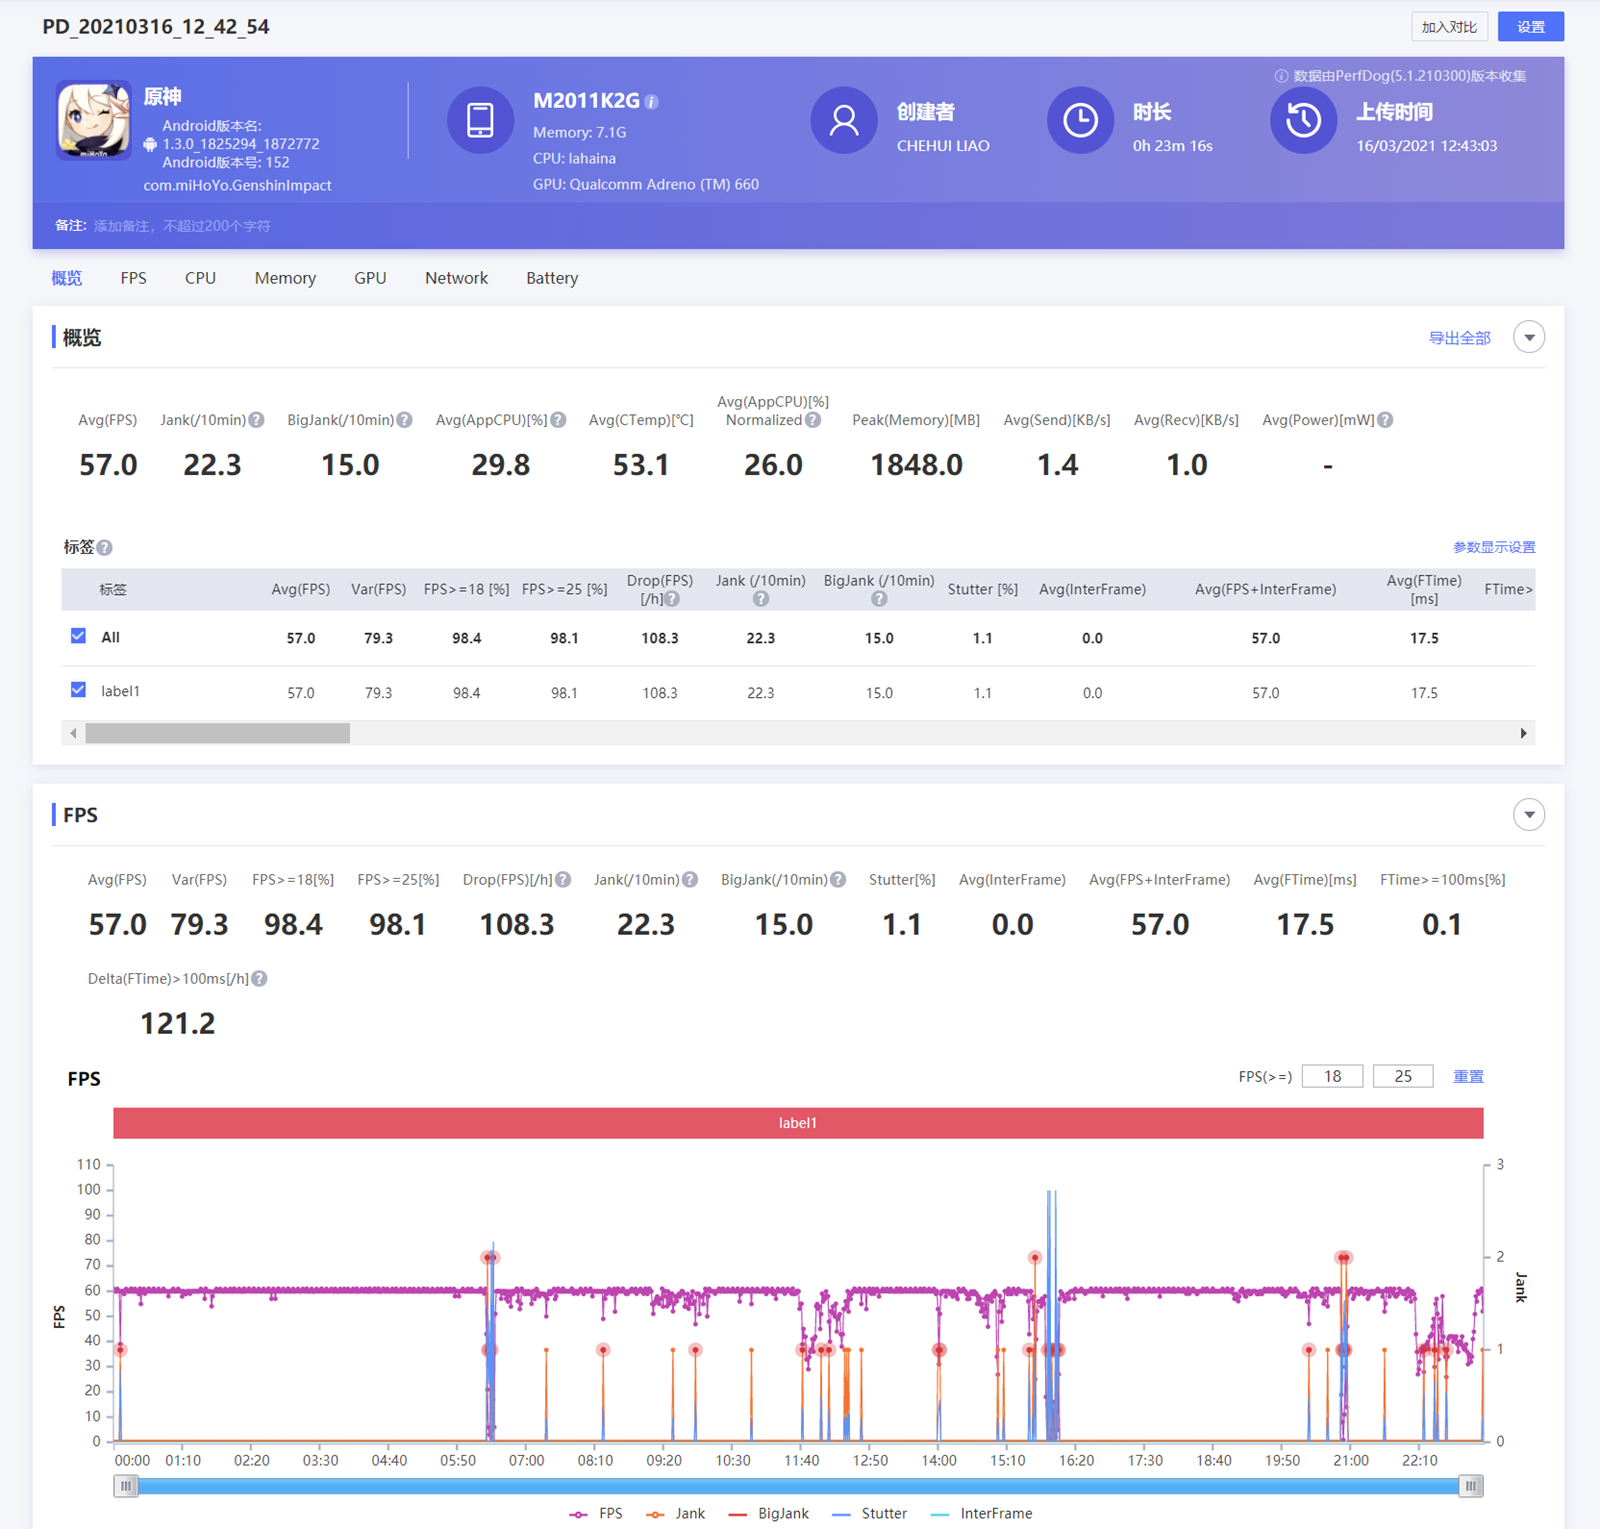 2021-03-17-18_38_35-PerfDog-_-移动全平台性能测试分析专家_thumb.png @3C 達人廖阿輝